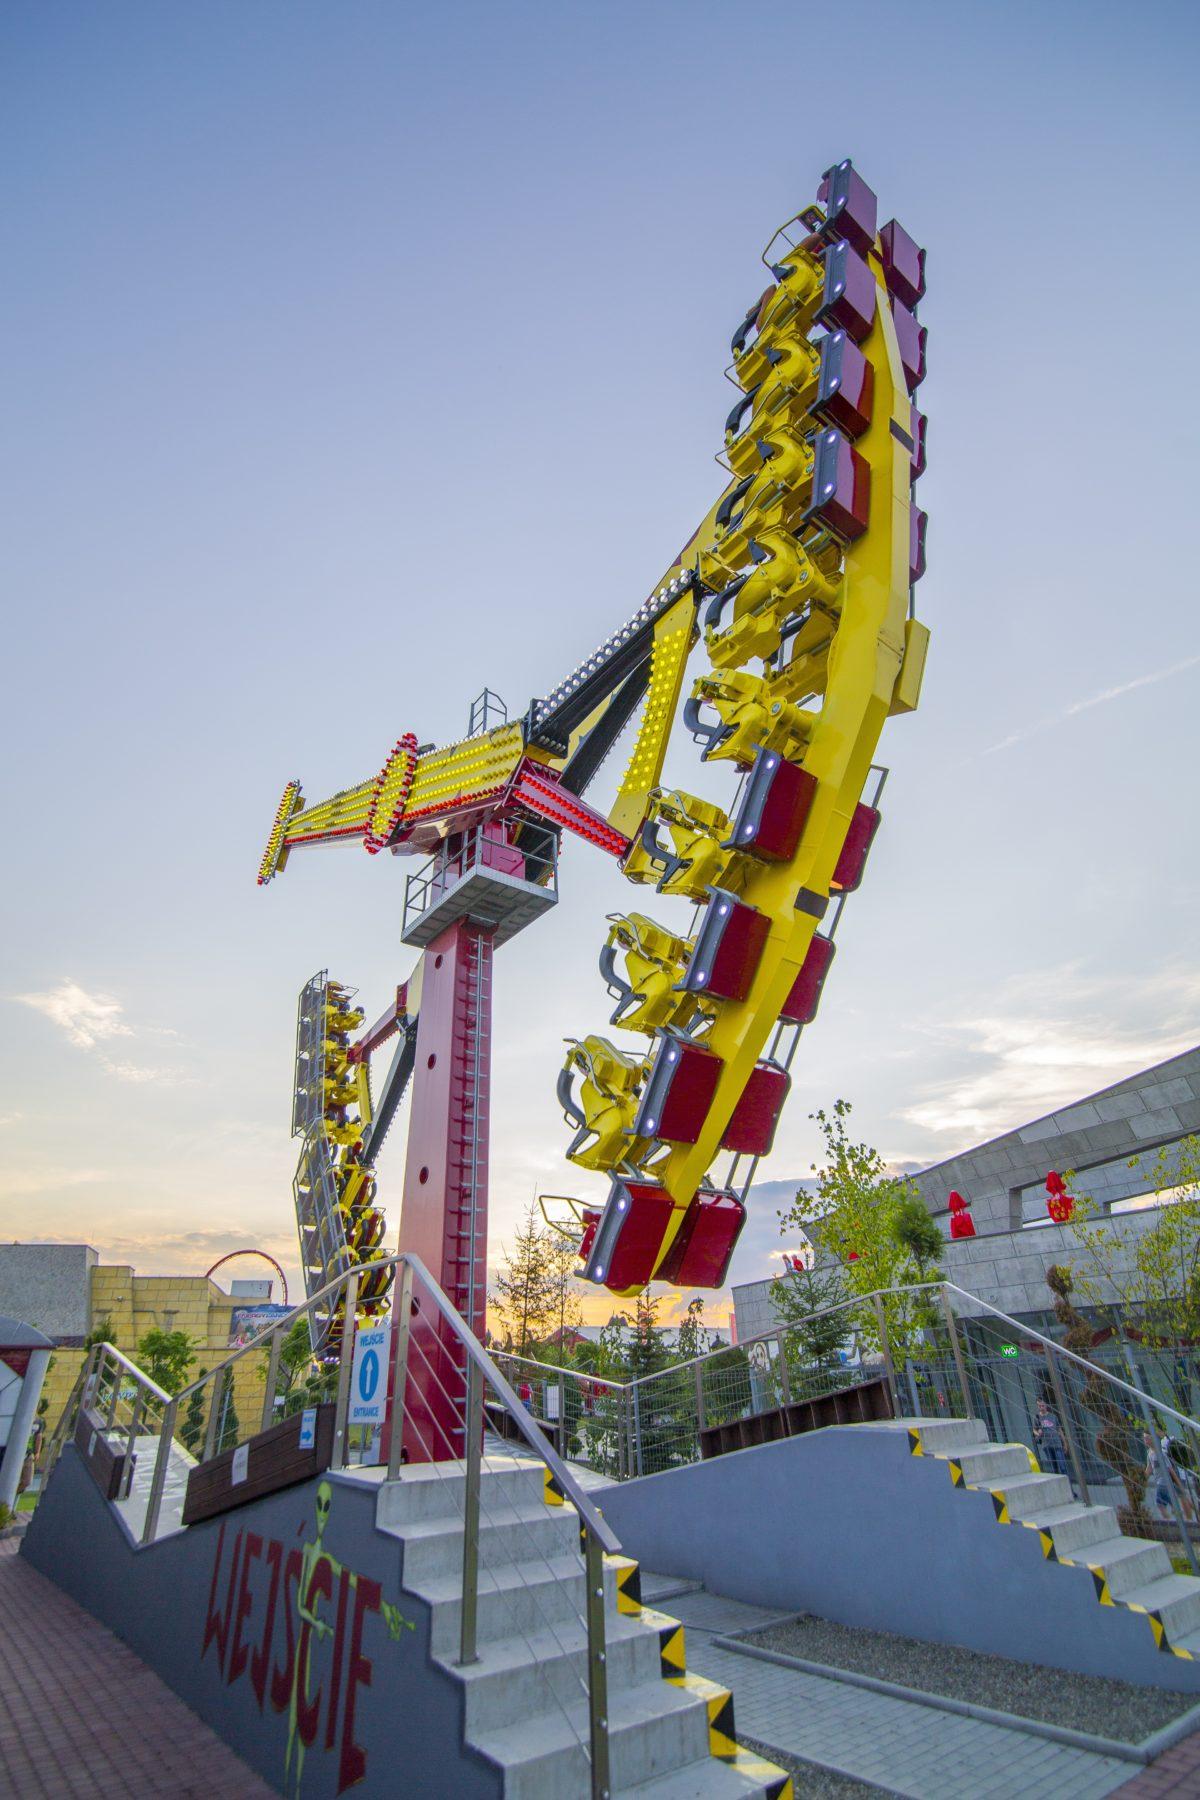 About Theme Park Energylandia Bigest Theme Park In Poland